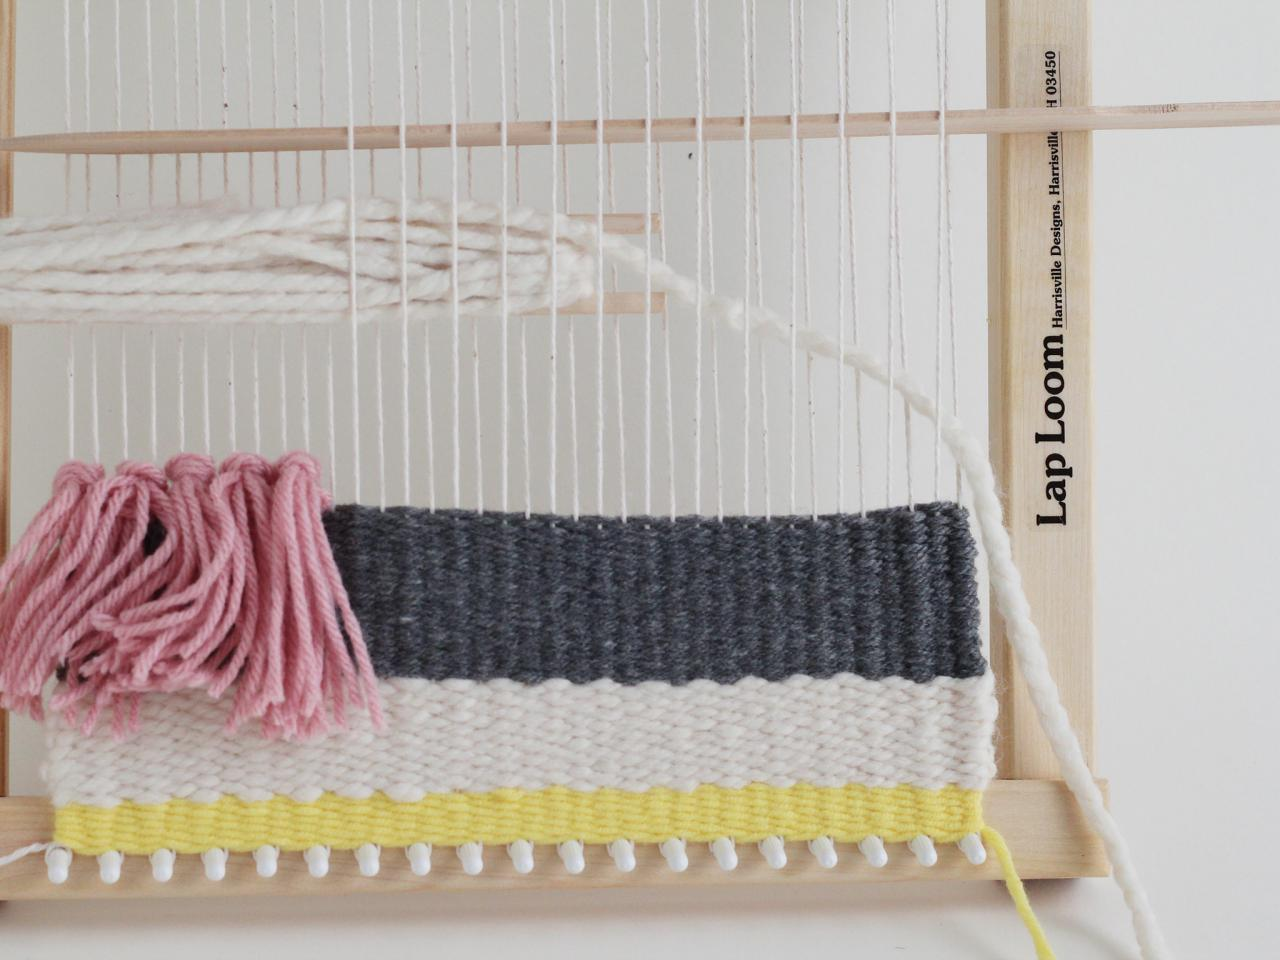 DIY Woven Wall Hanging   HGTV